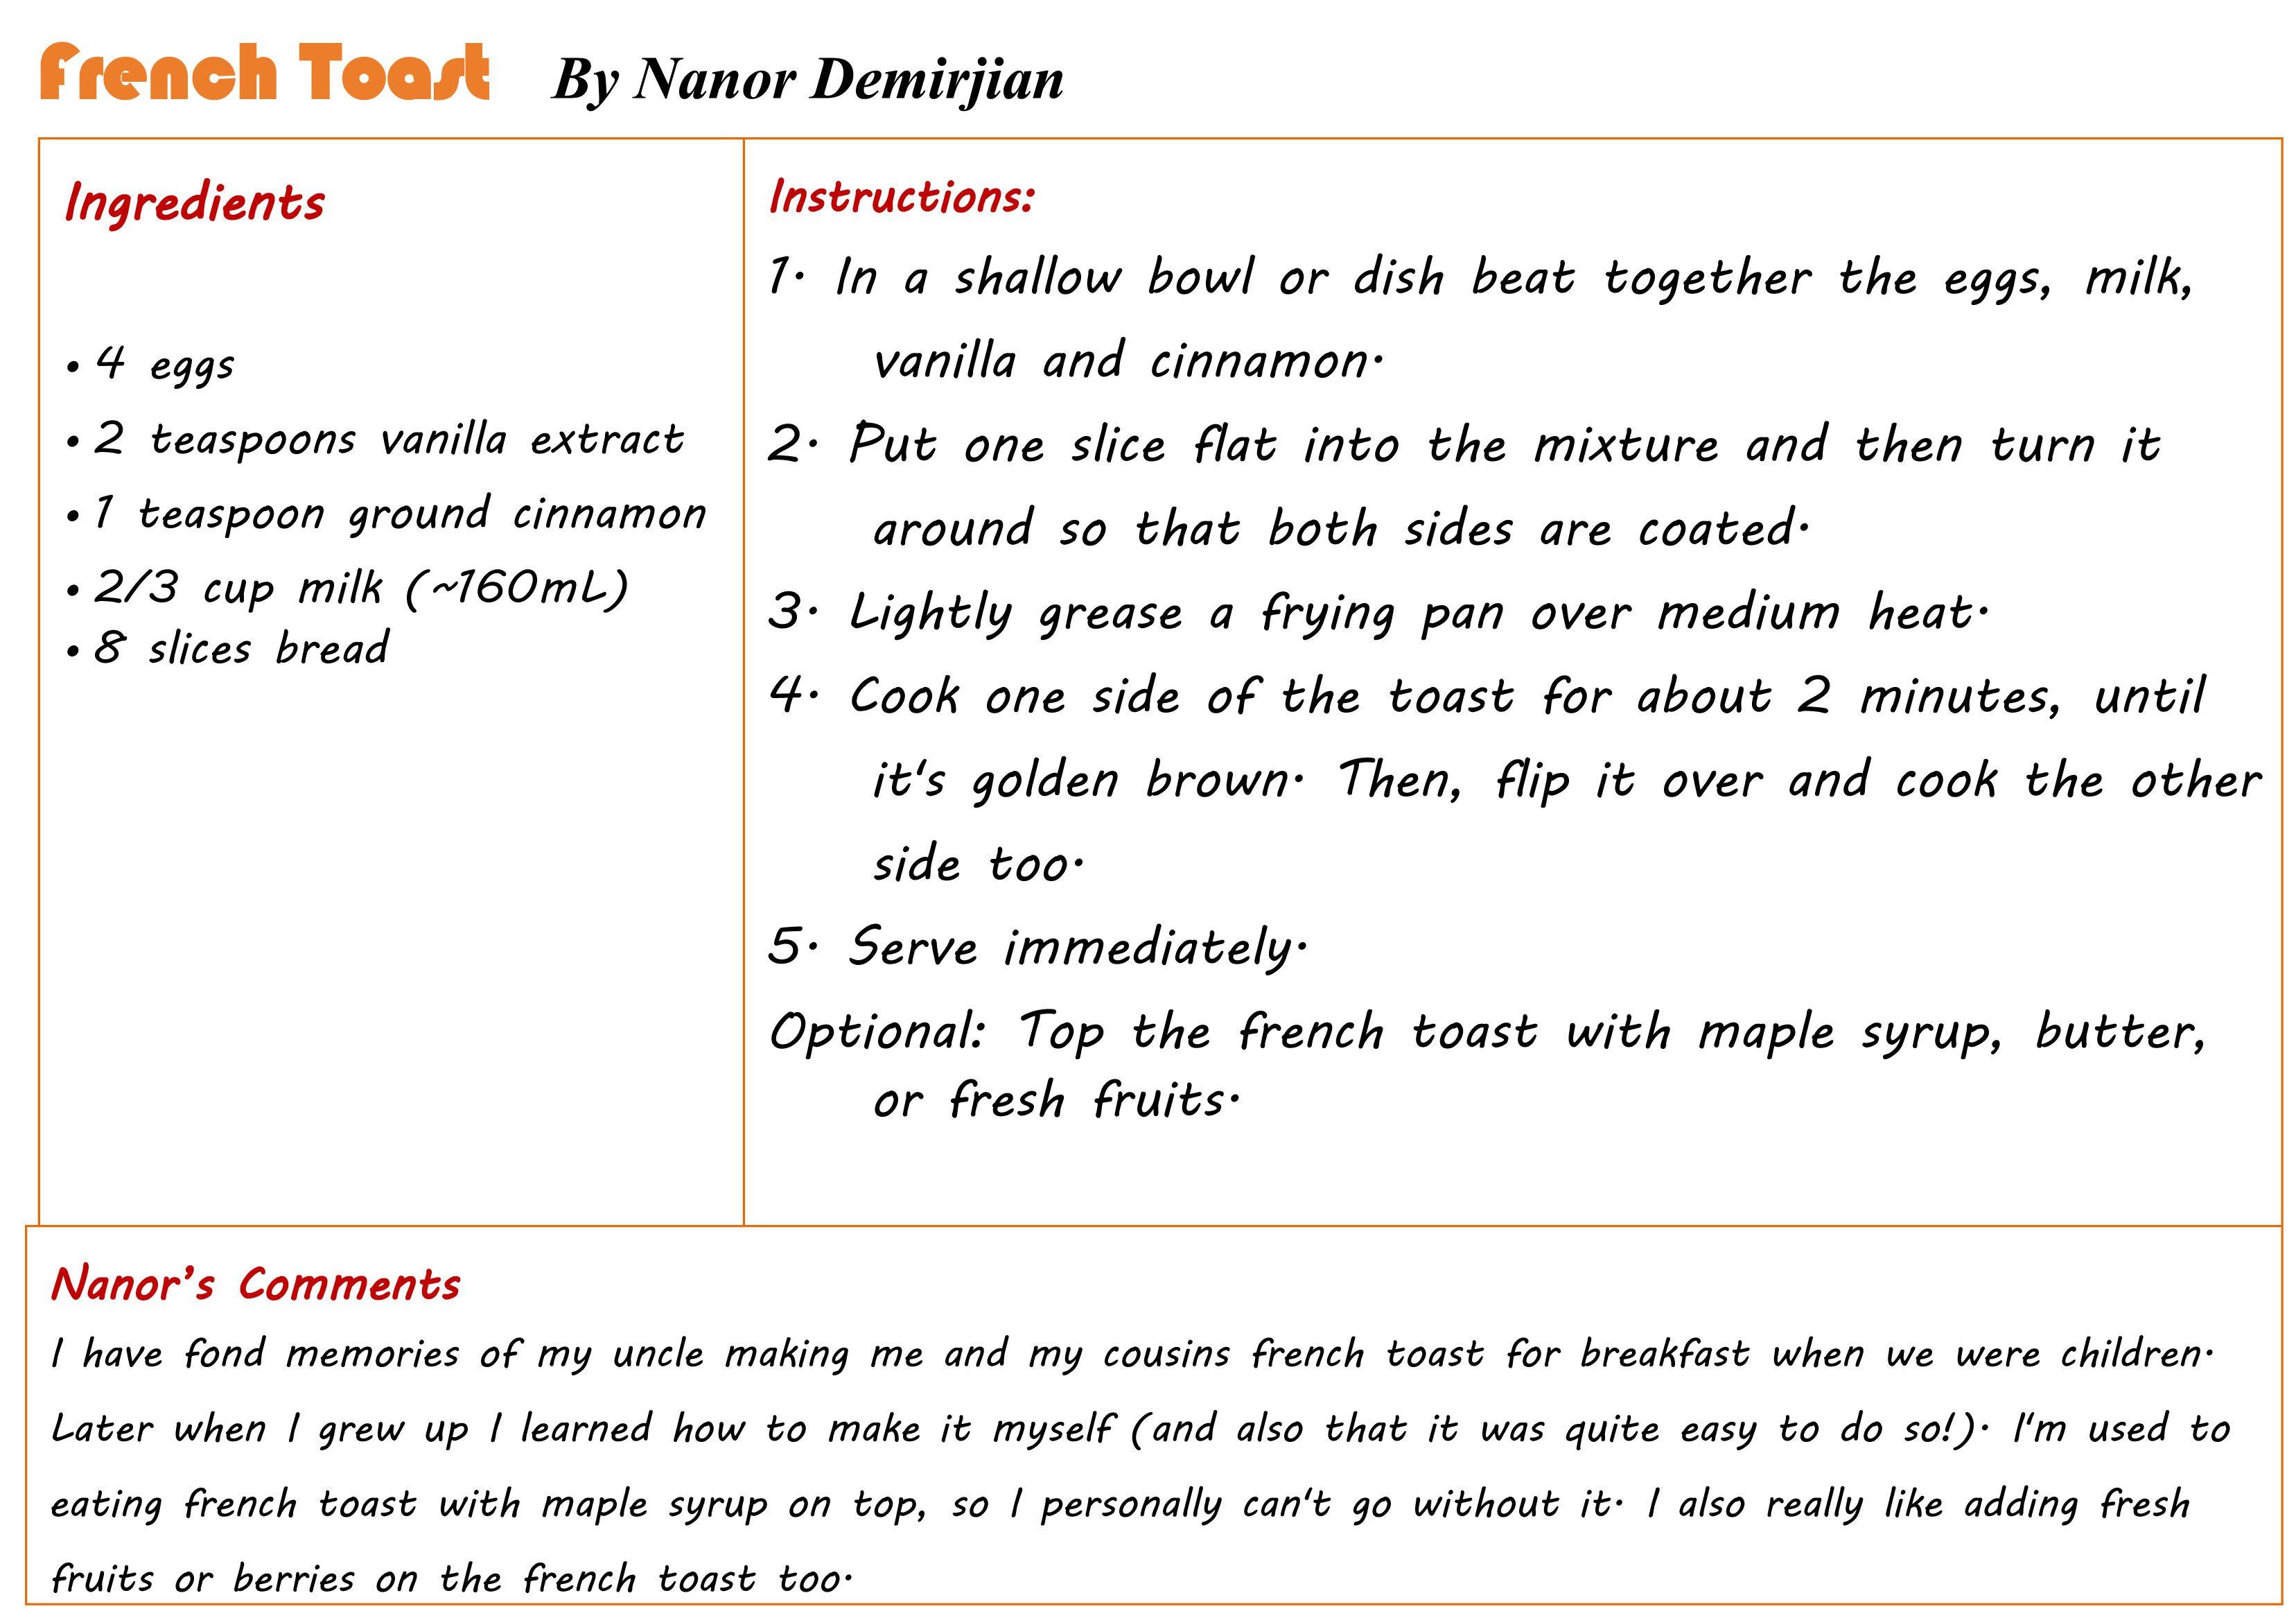 Receta del french toast del family book club instituto internacional receta de french toast por nanor demirjian para el family book club solutioingenieria Choice Image